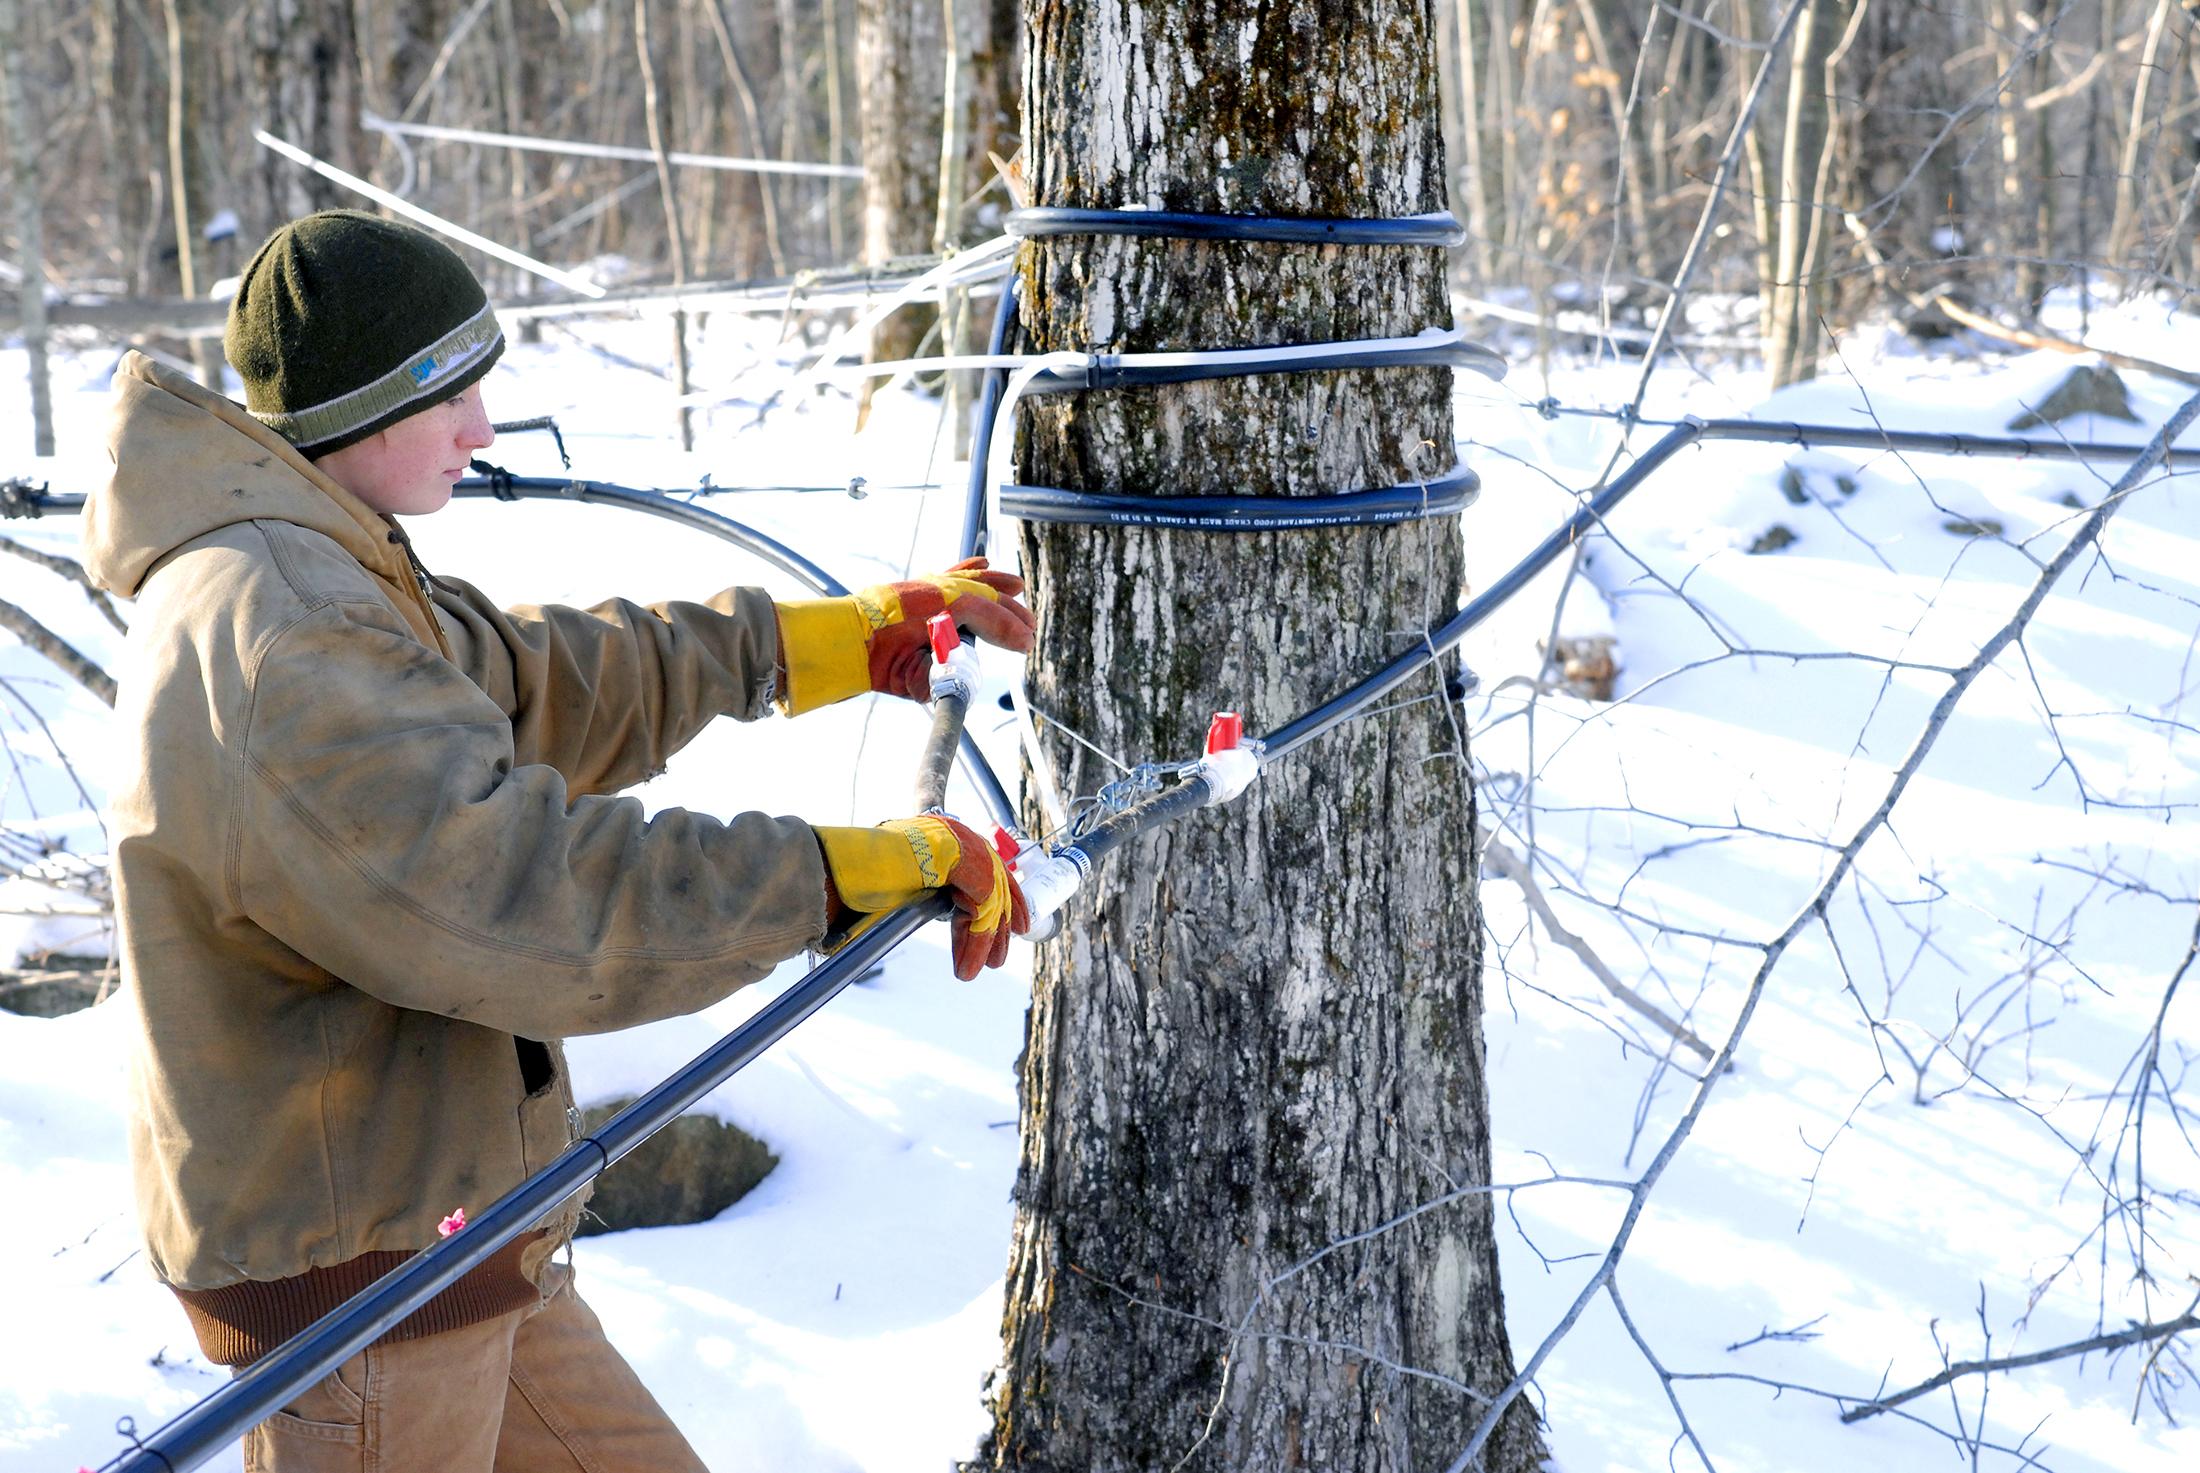 UMass studying climate change impact on maple syrup quality